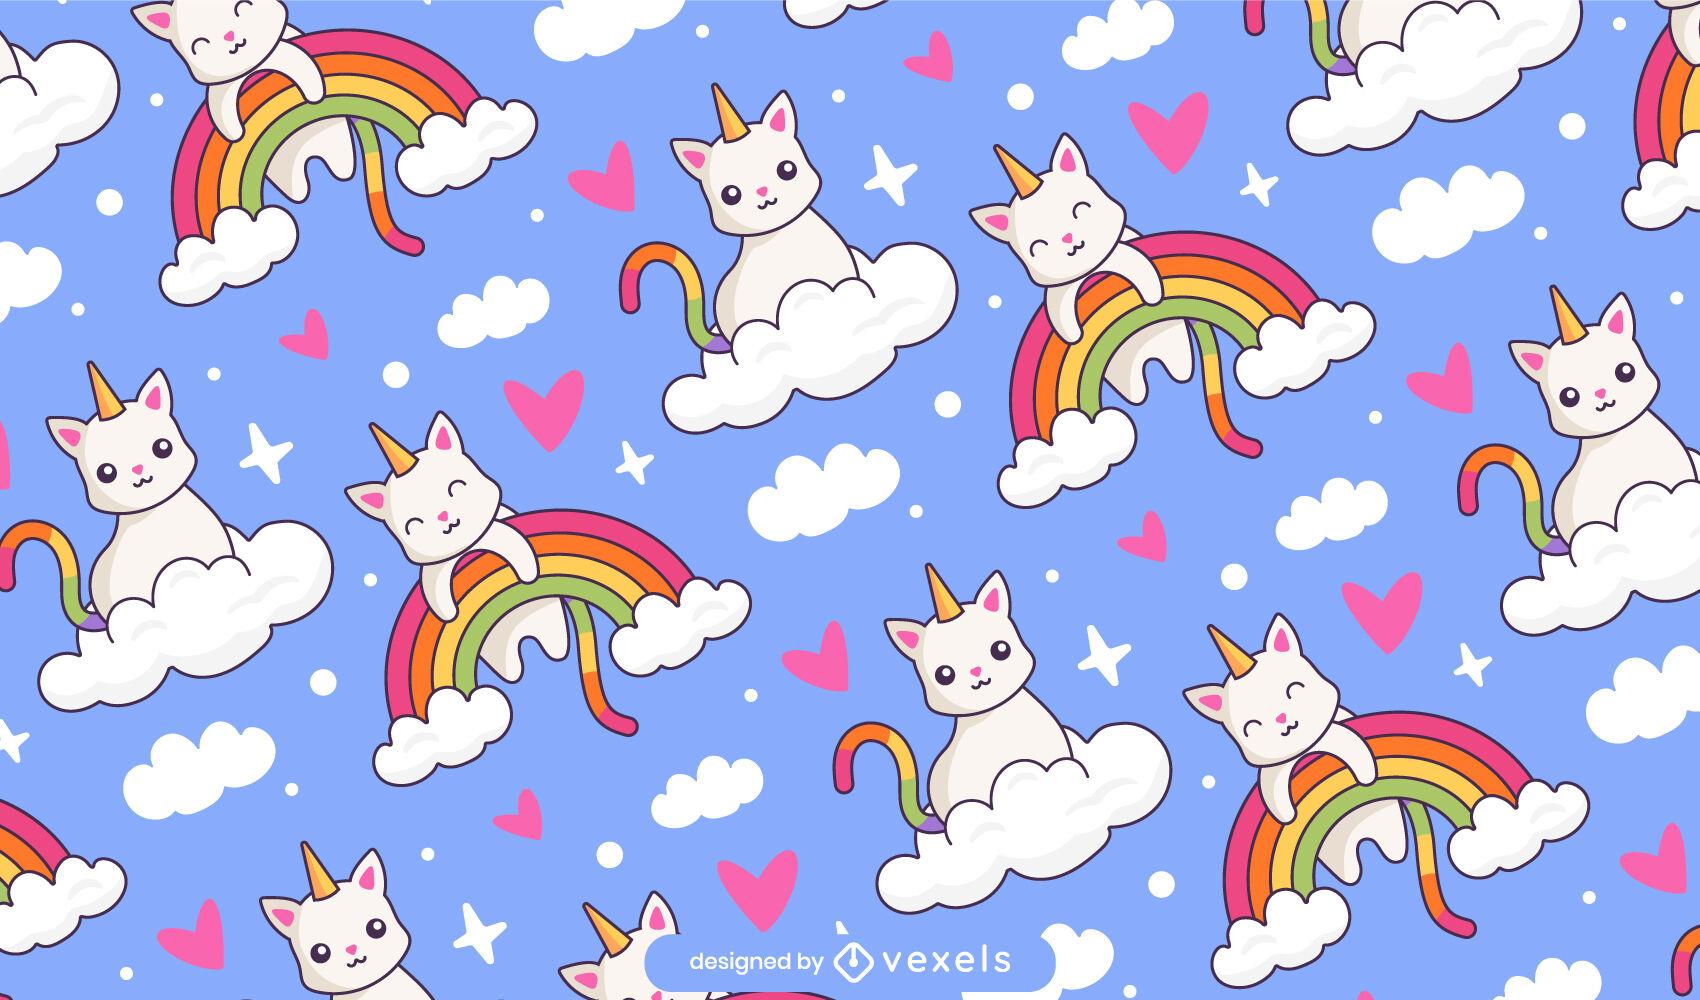 Unicorn cat animals on rainbows pattern